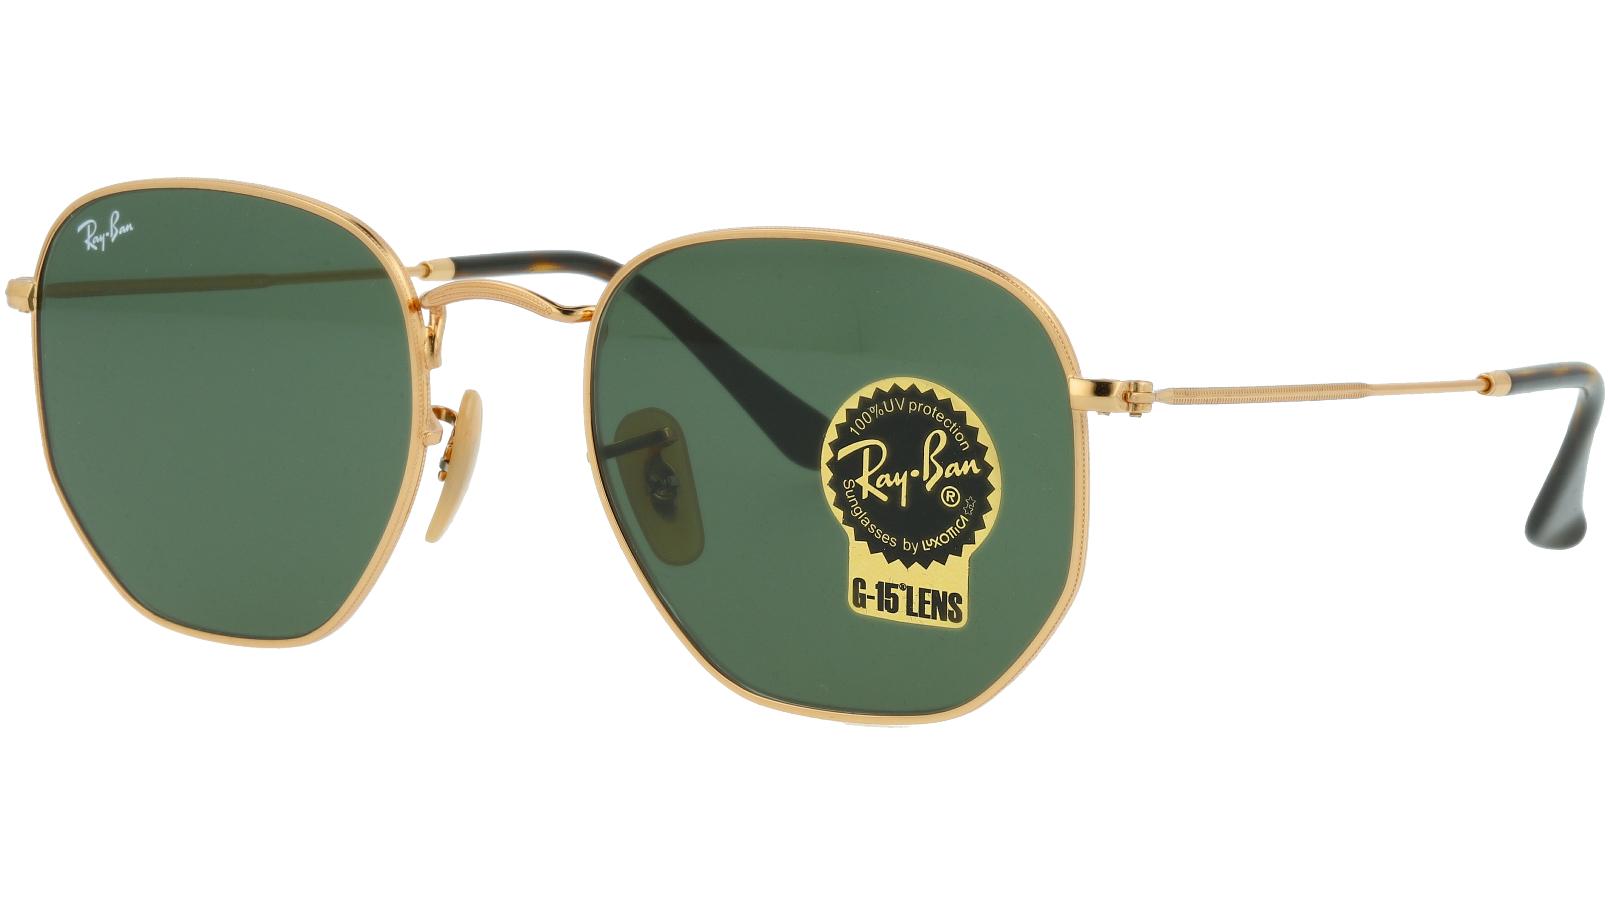 Ray-Ban RB3548N 001 54 Arista Hexagonal Sunglasses